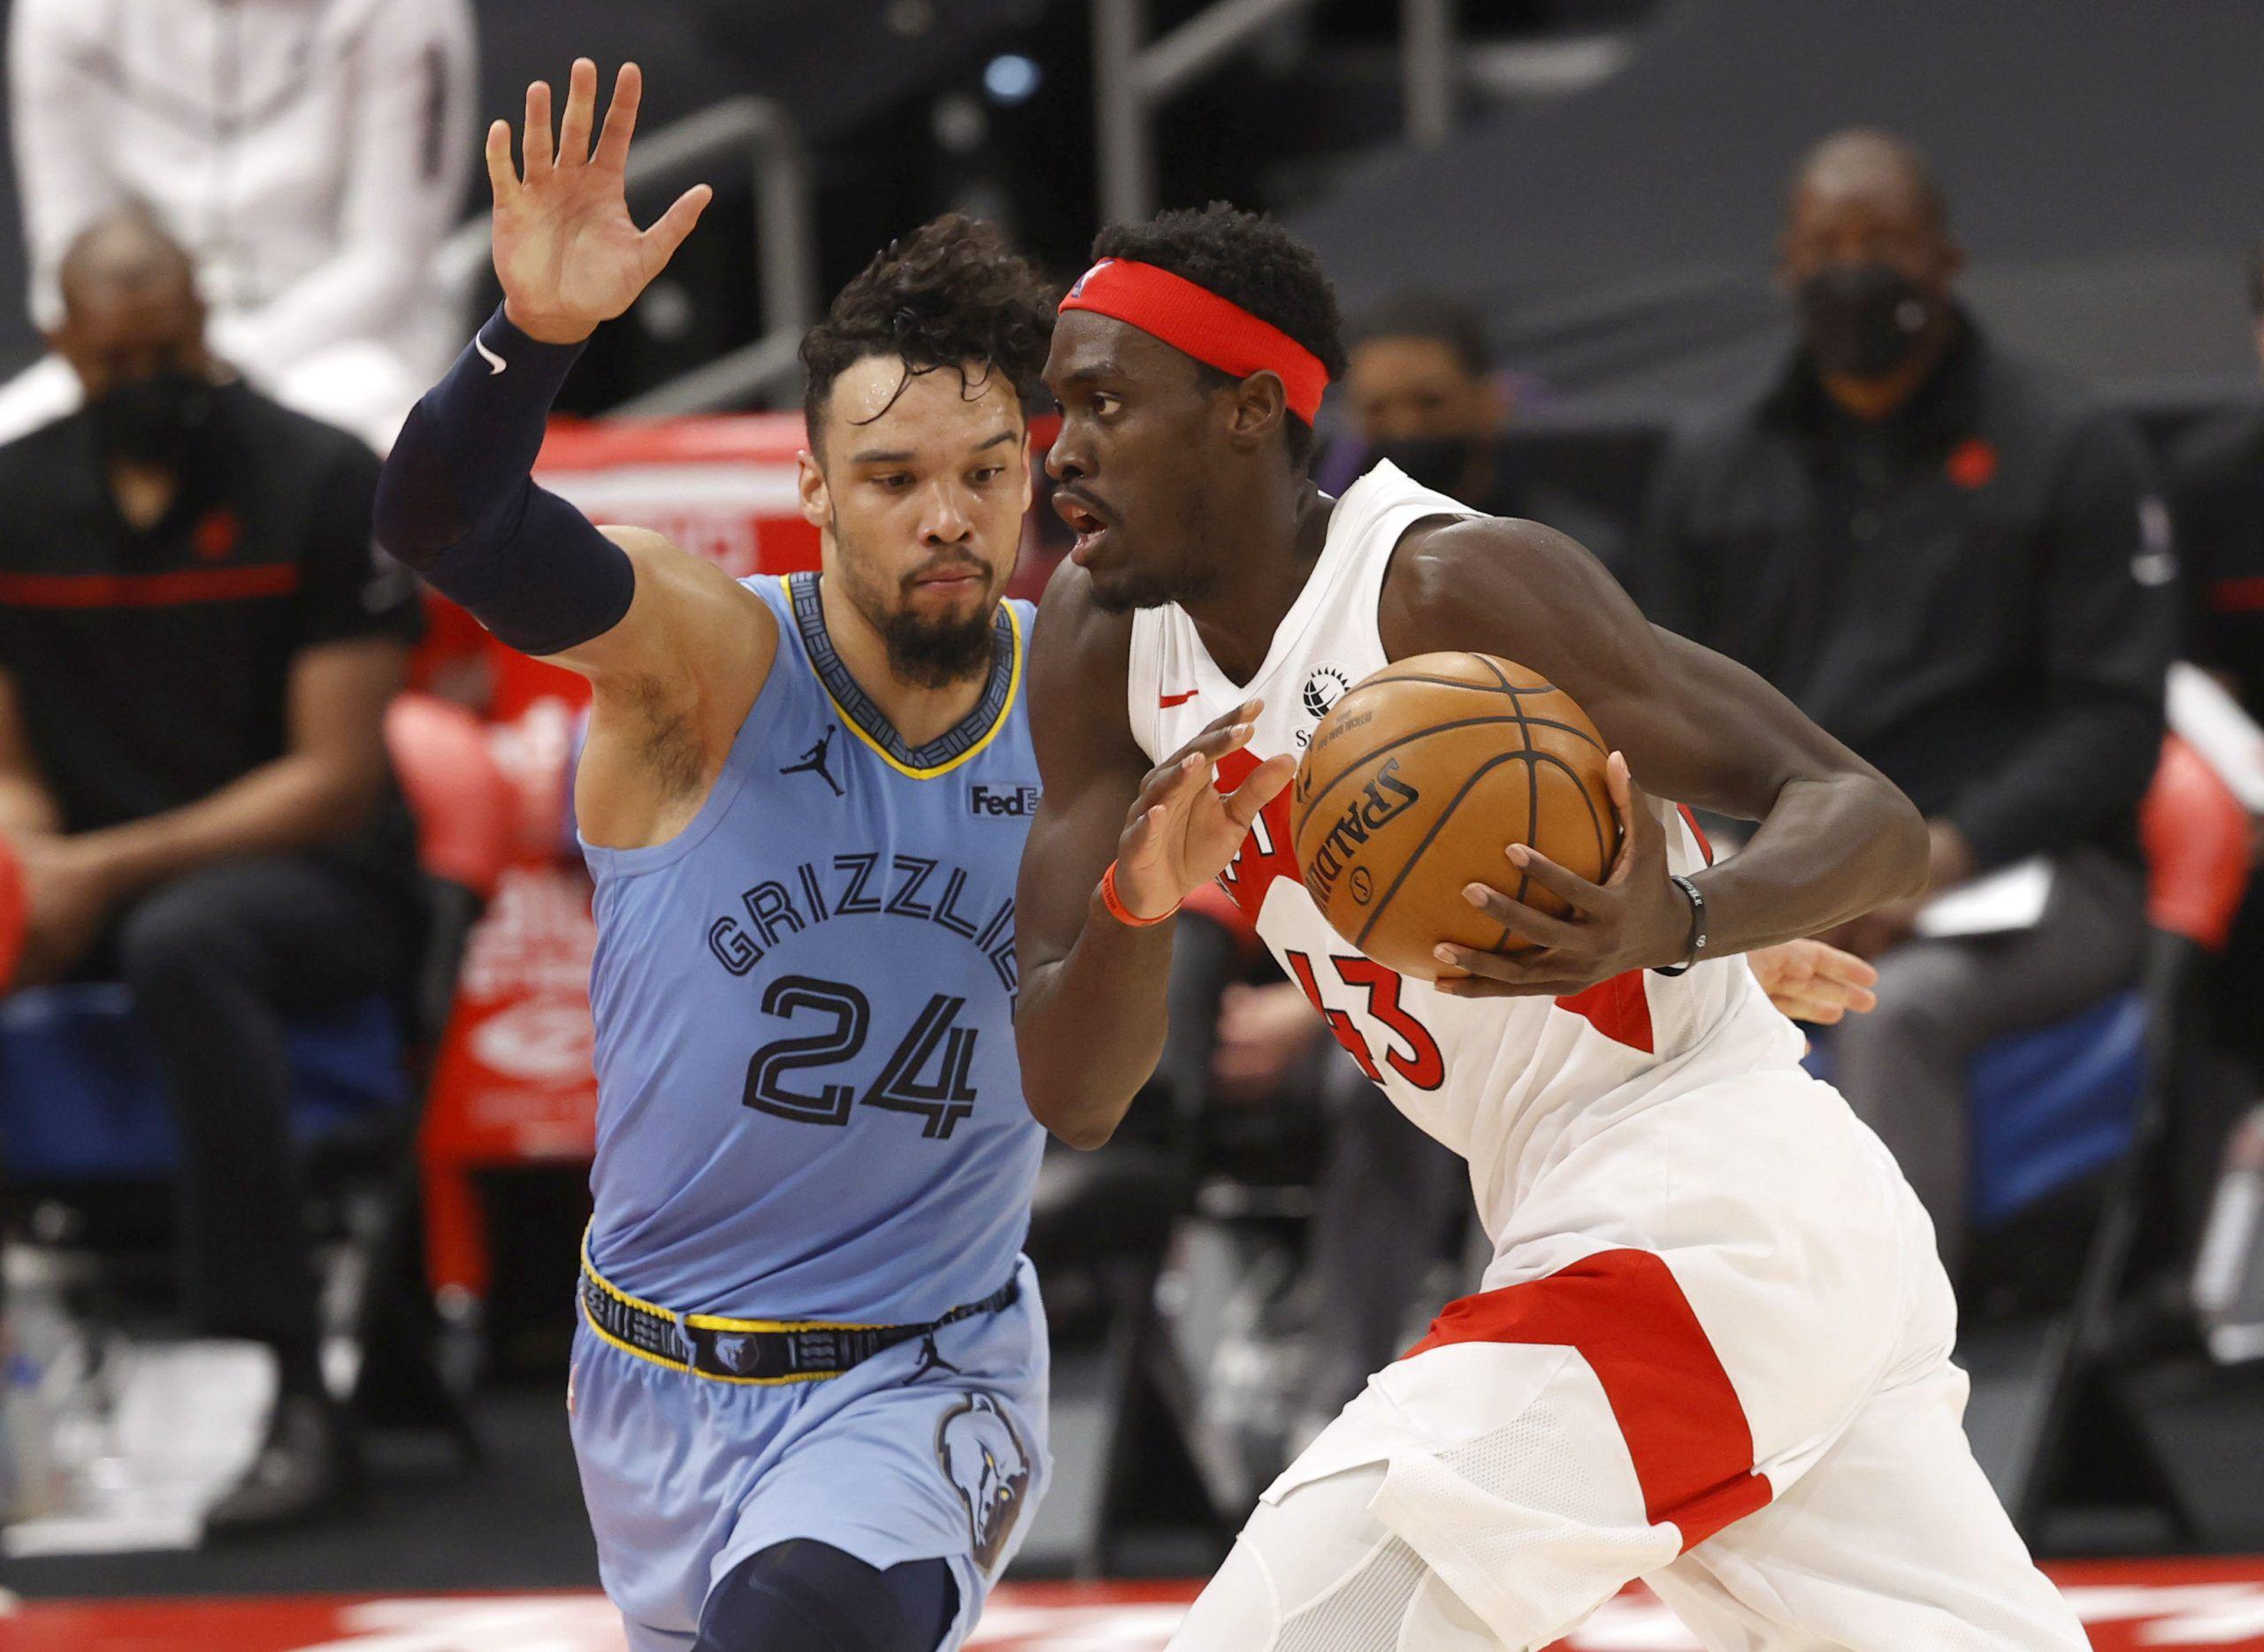 Toronto Raptors forward Pascal Siakam drives to the basket against Canadian Memphis Grizzlies forward Dillon Brooks.